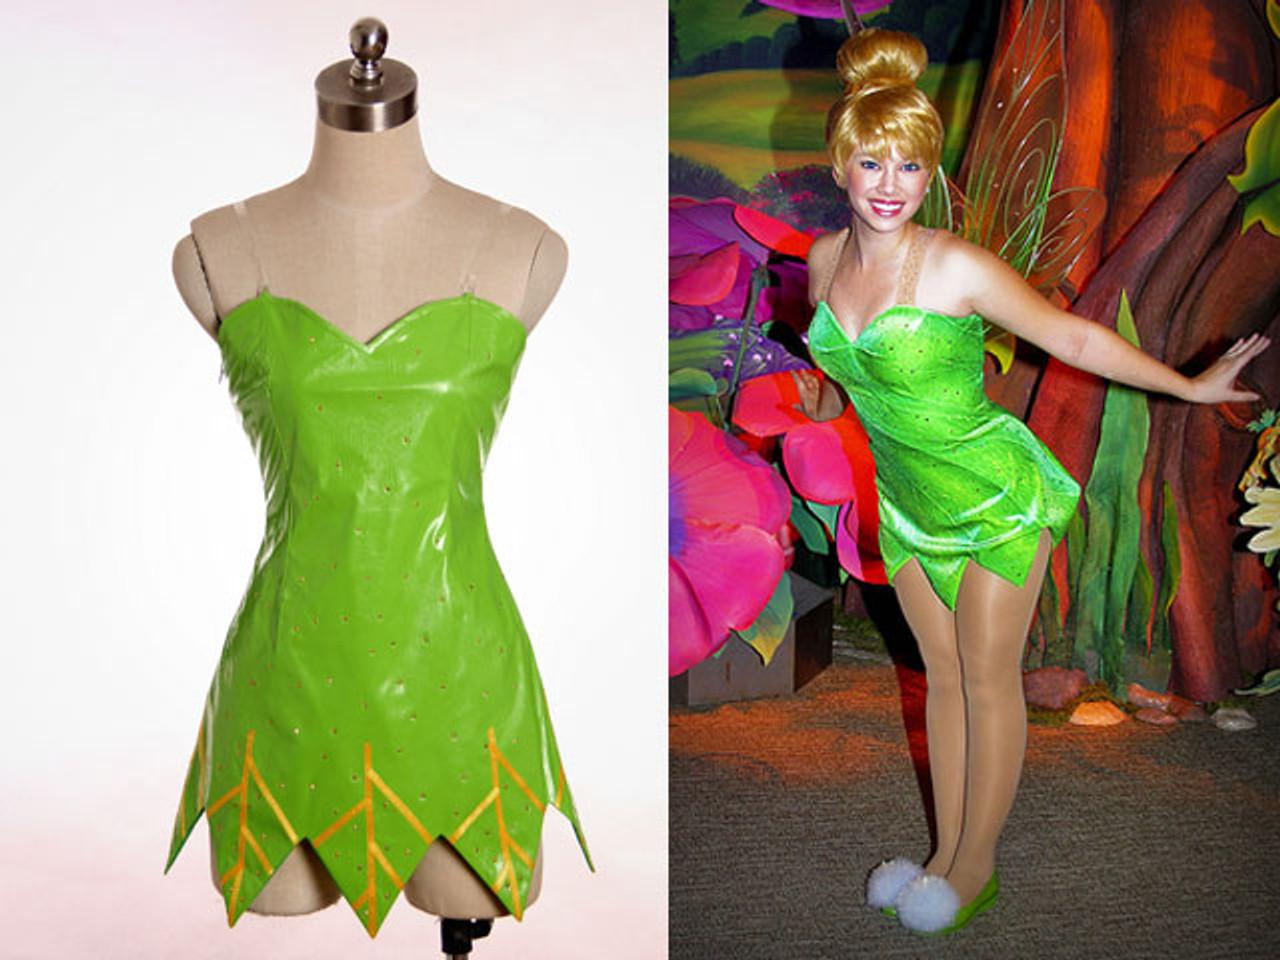 bd5bf27ebc585 Disney Tinker Bell Cosplay, Tinker Bell Polyester Dress